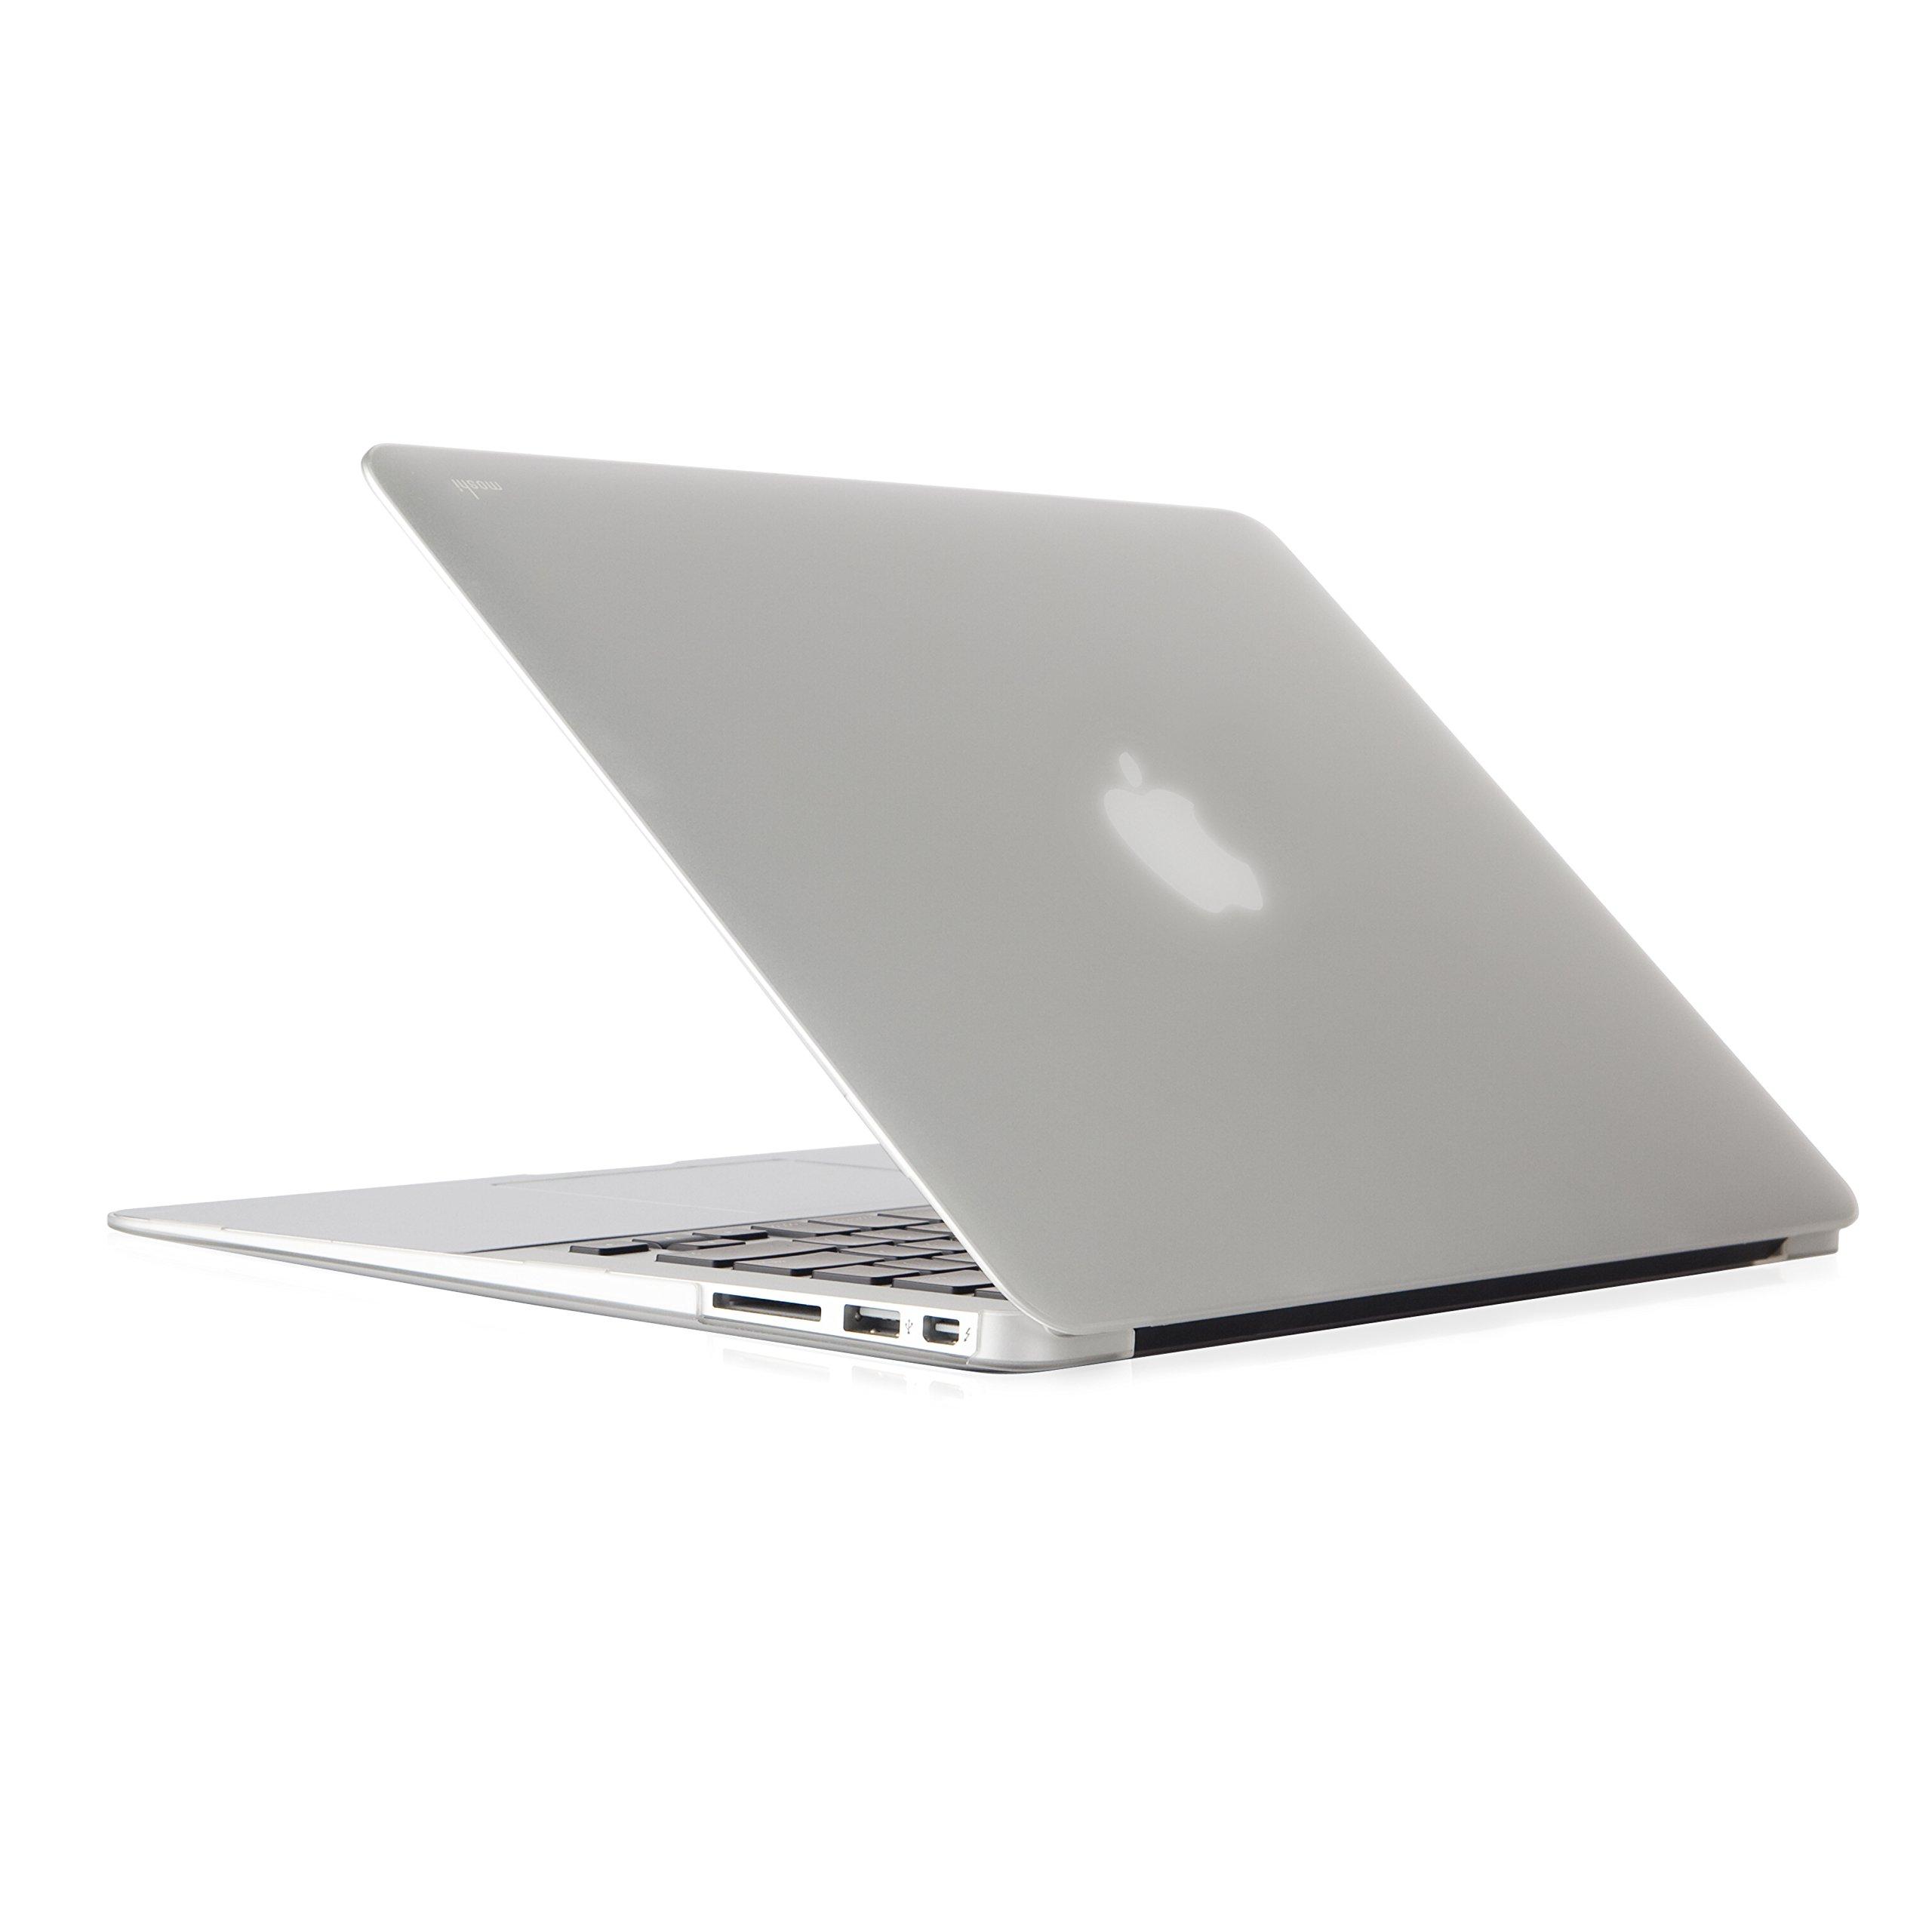 "Moshi iGlaze Hardshell Case for MacBook Air 13"" 2010-2017 (Clear)"